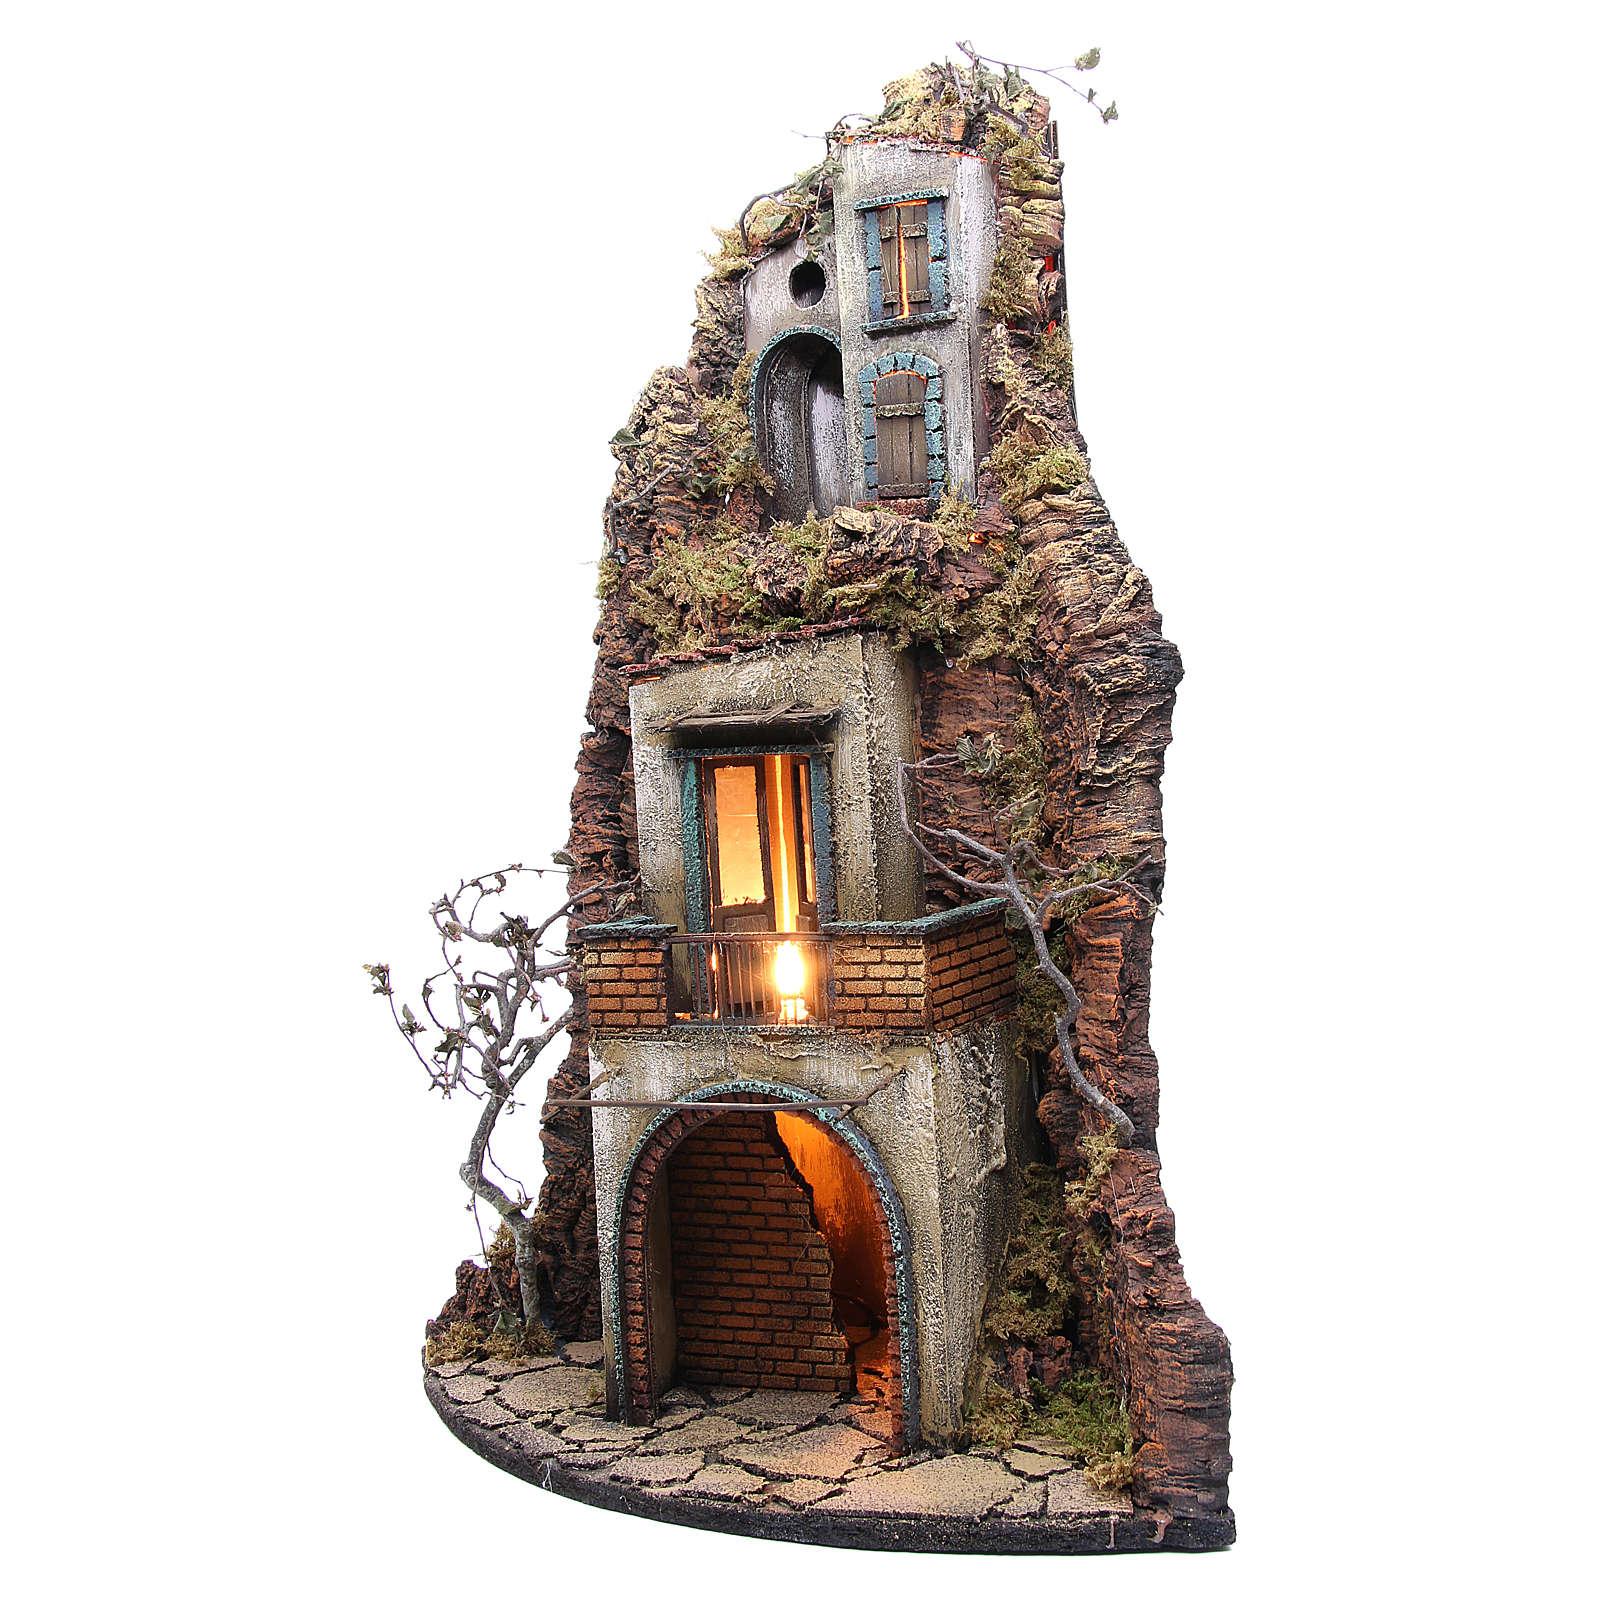 Borgo presepe napoletano 74x40x36 fontana e luce 4